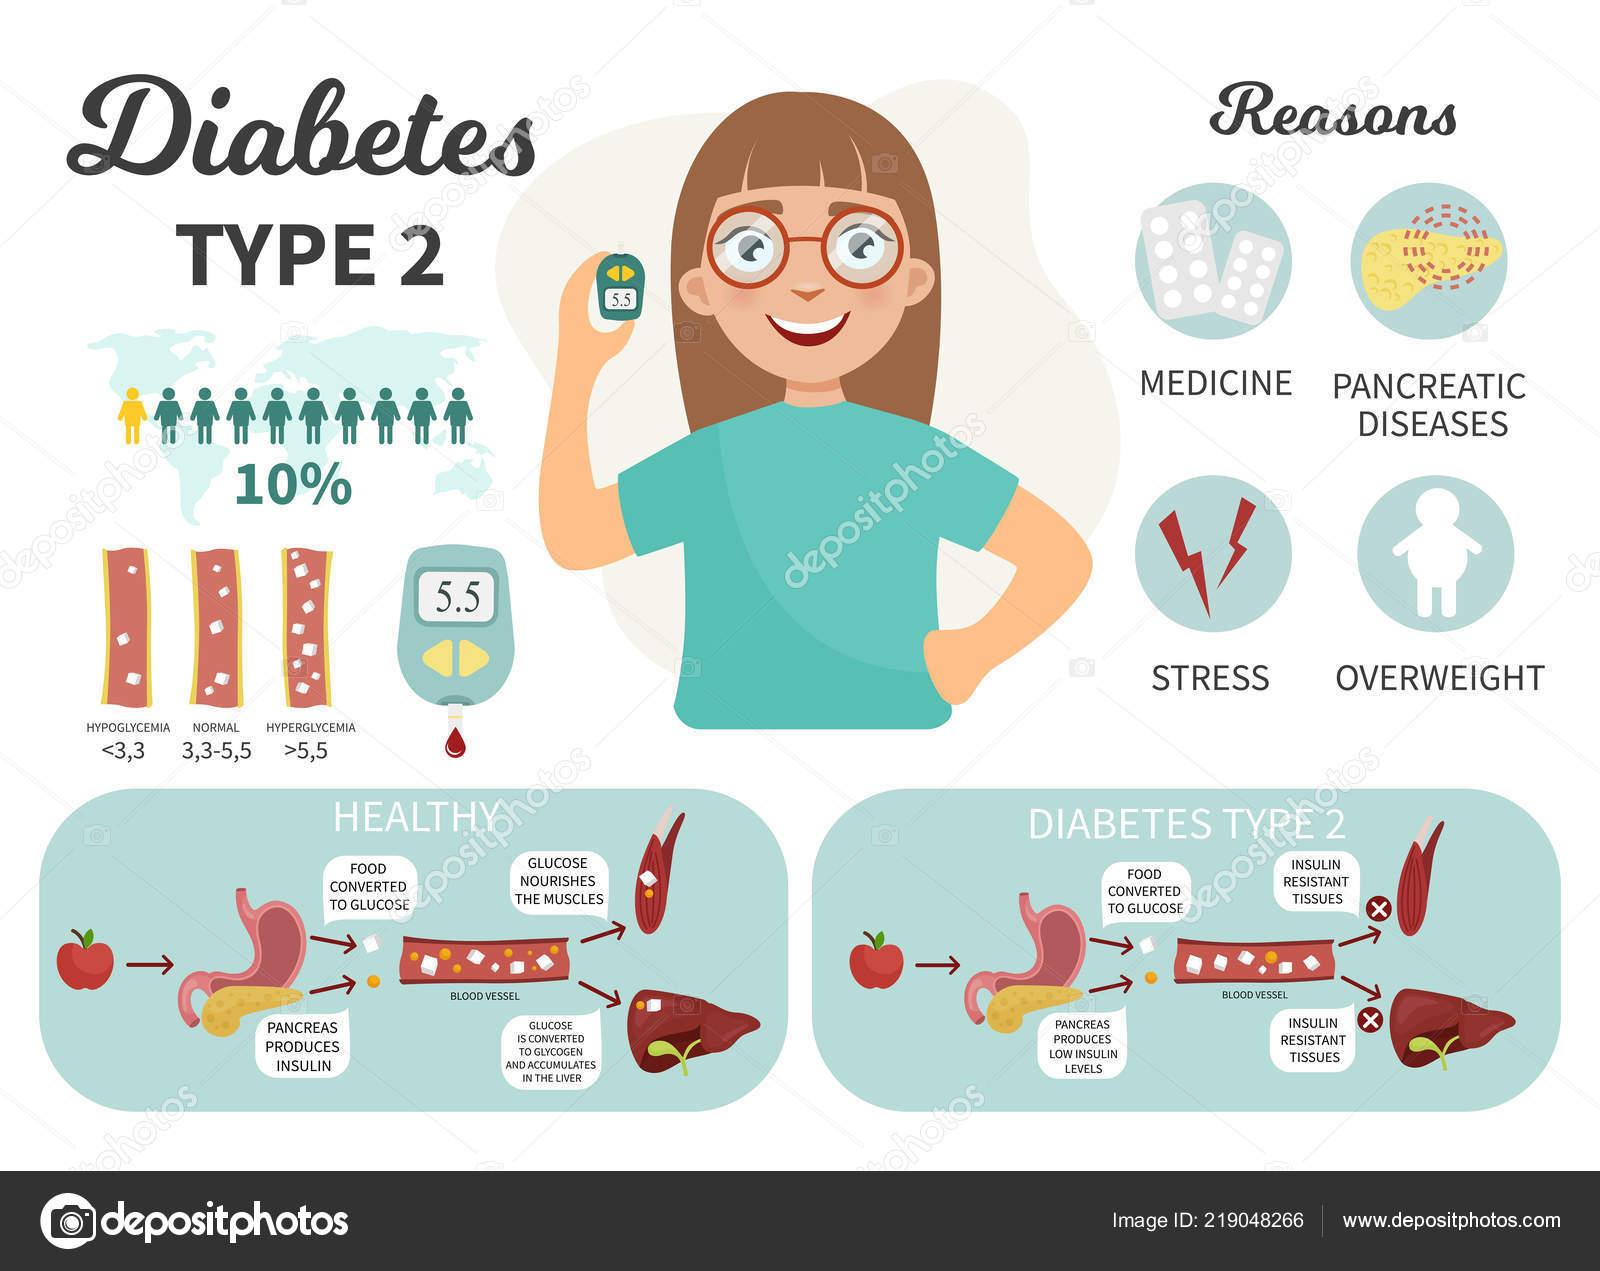 nadolol causa diabetes tipo 1